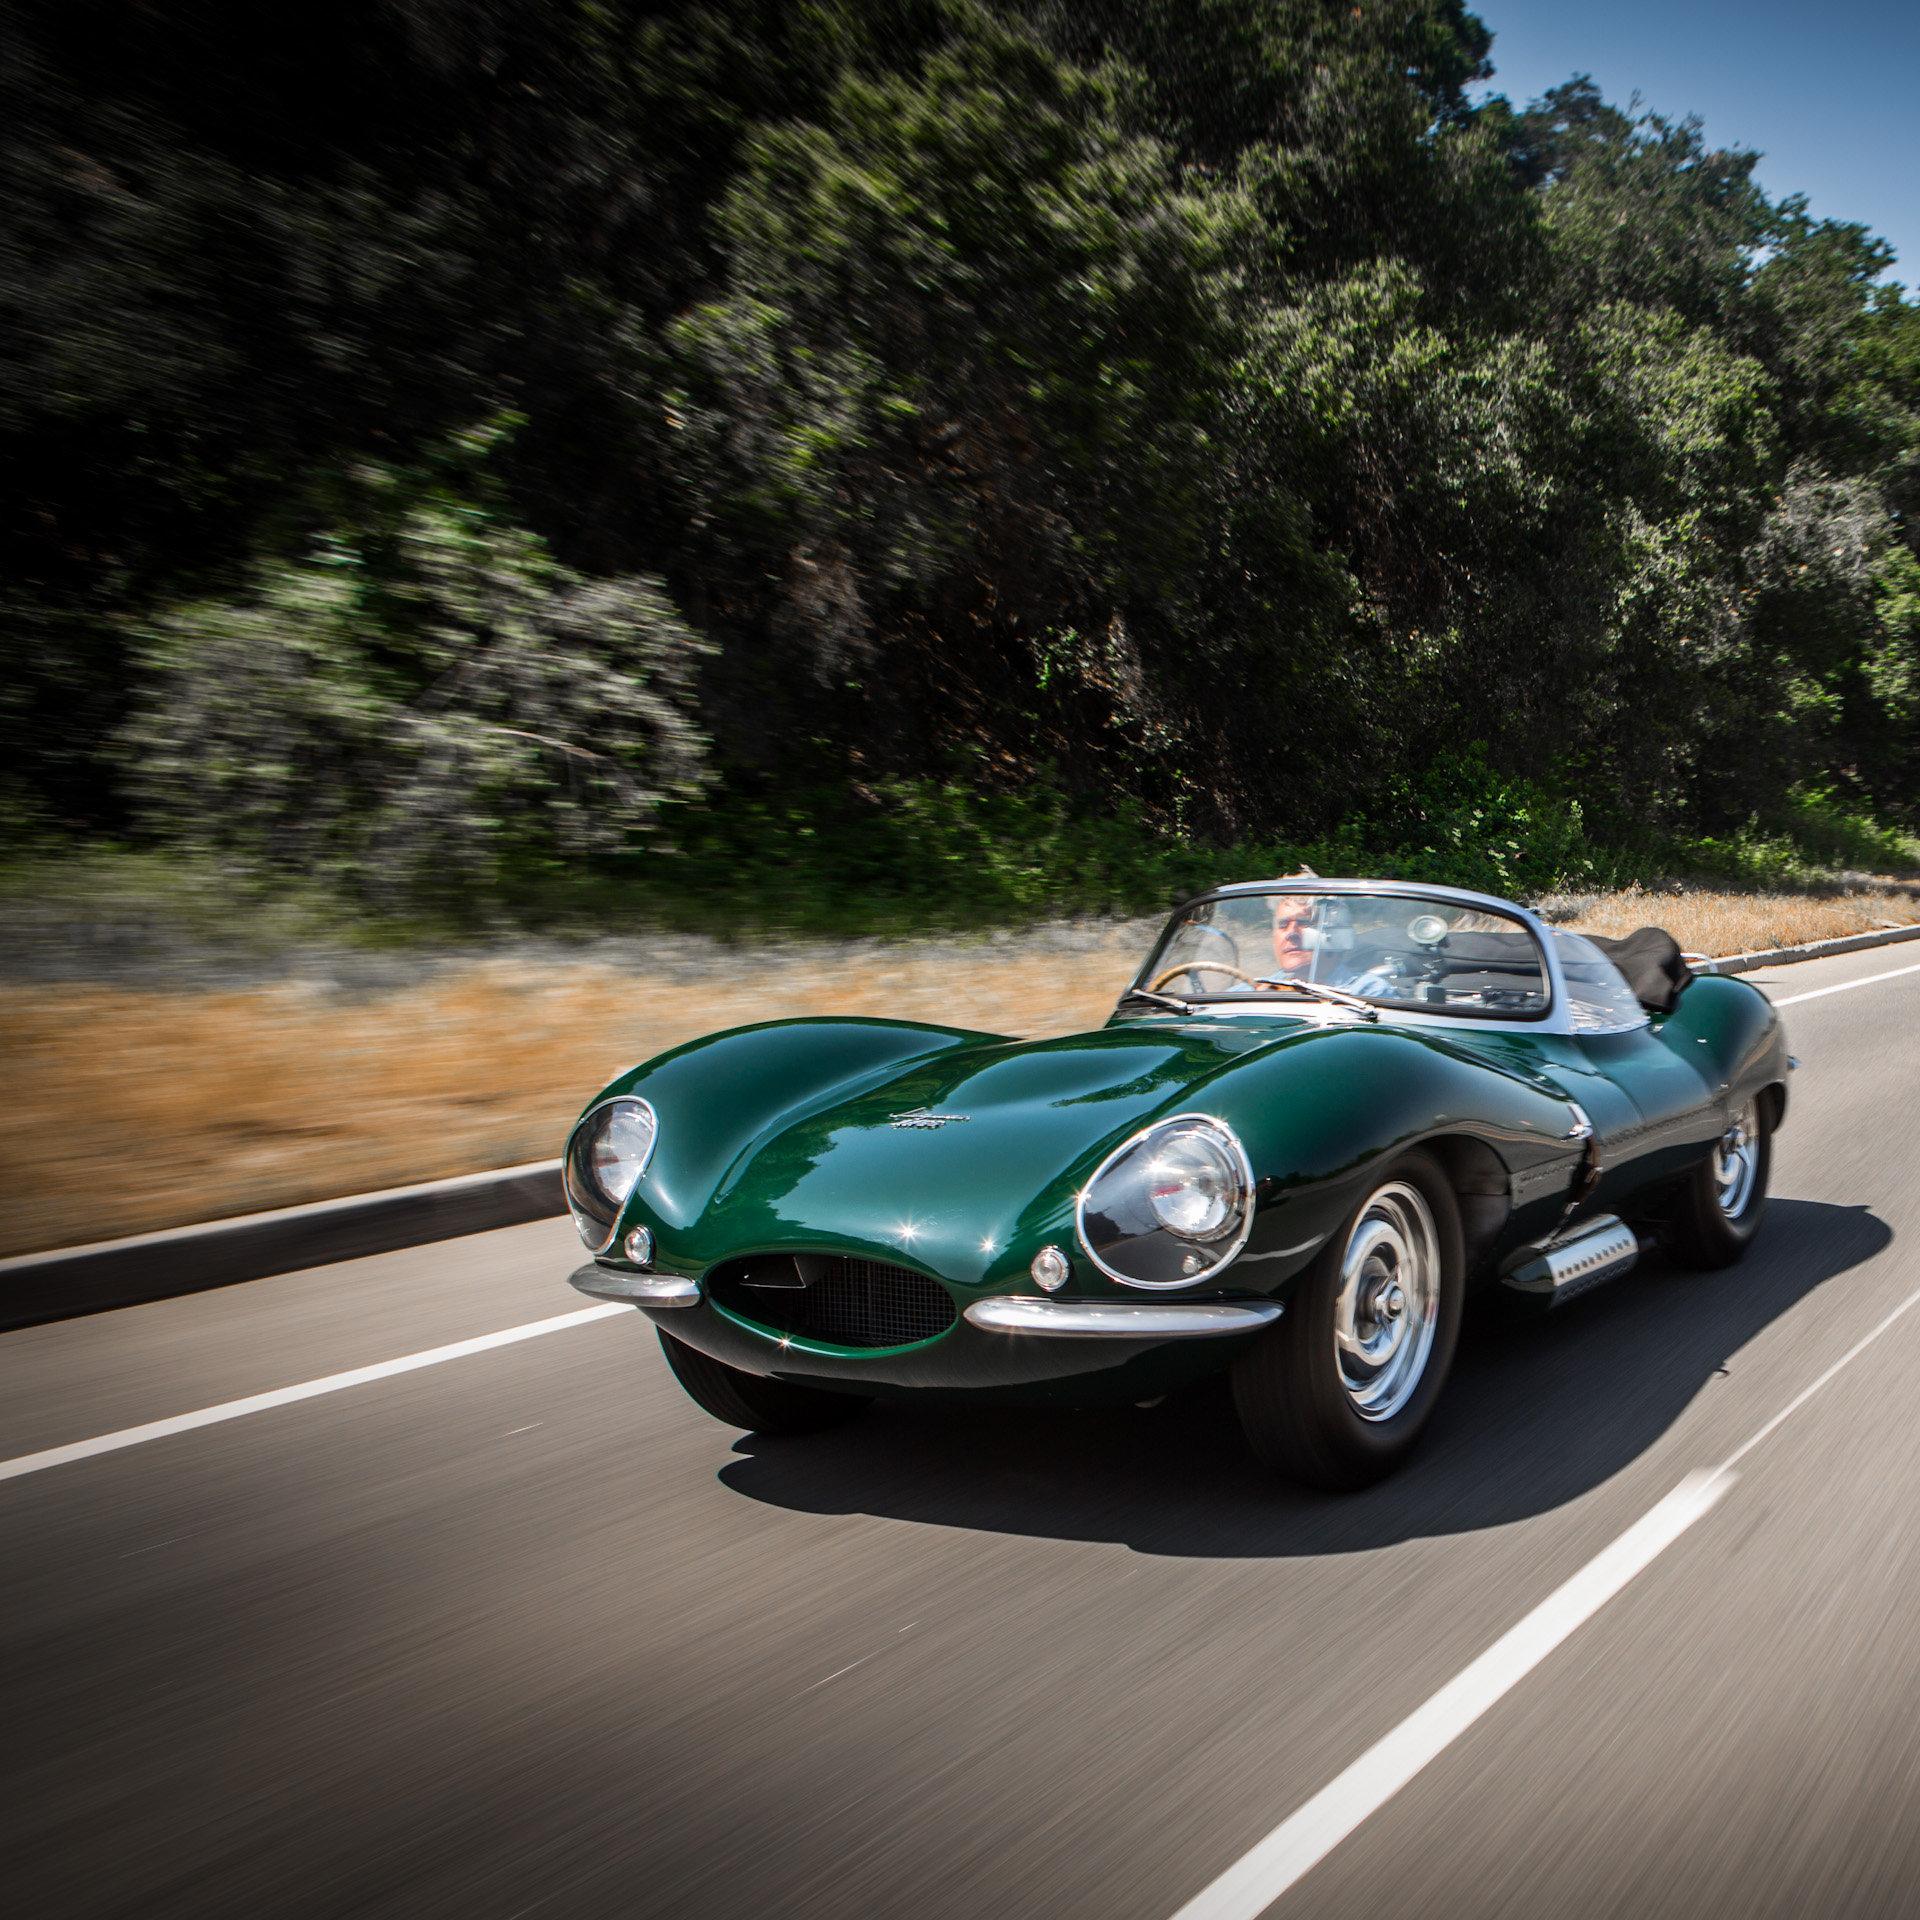 Cars Jaguar: Steve McQueen's 1956 Jaguar XKSS